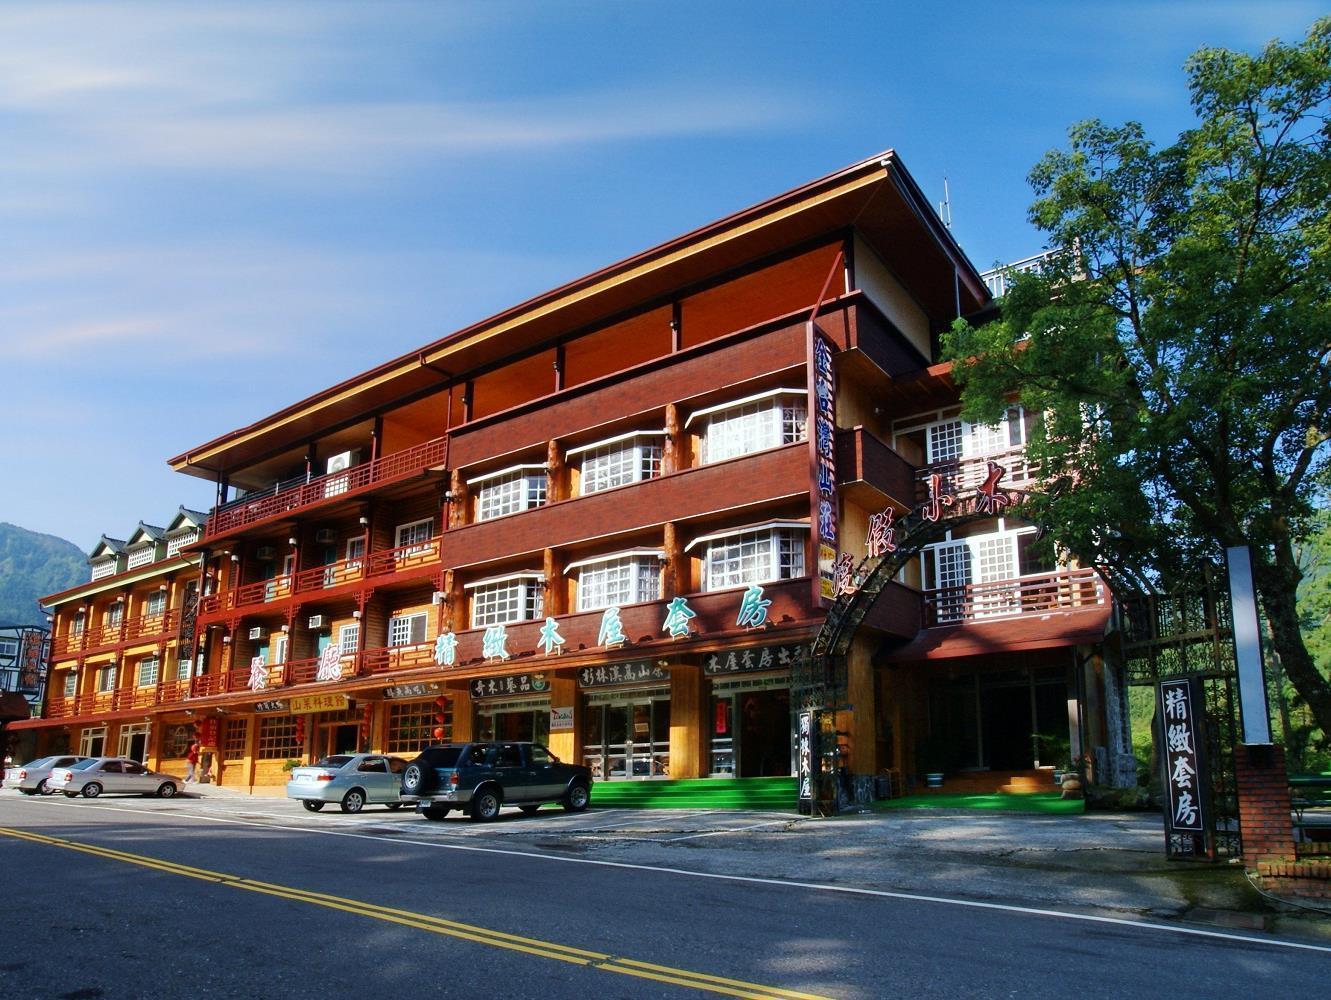 cheap hotels in taiwan 19 a night updated 2019 promos rh agoda com